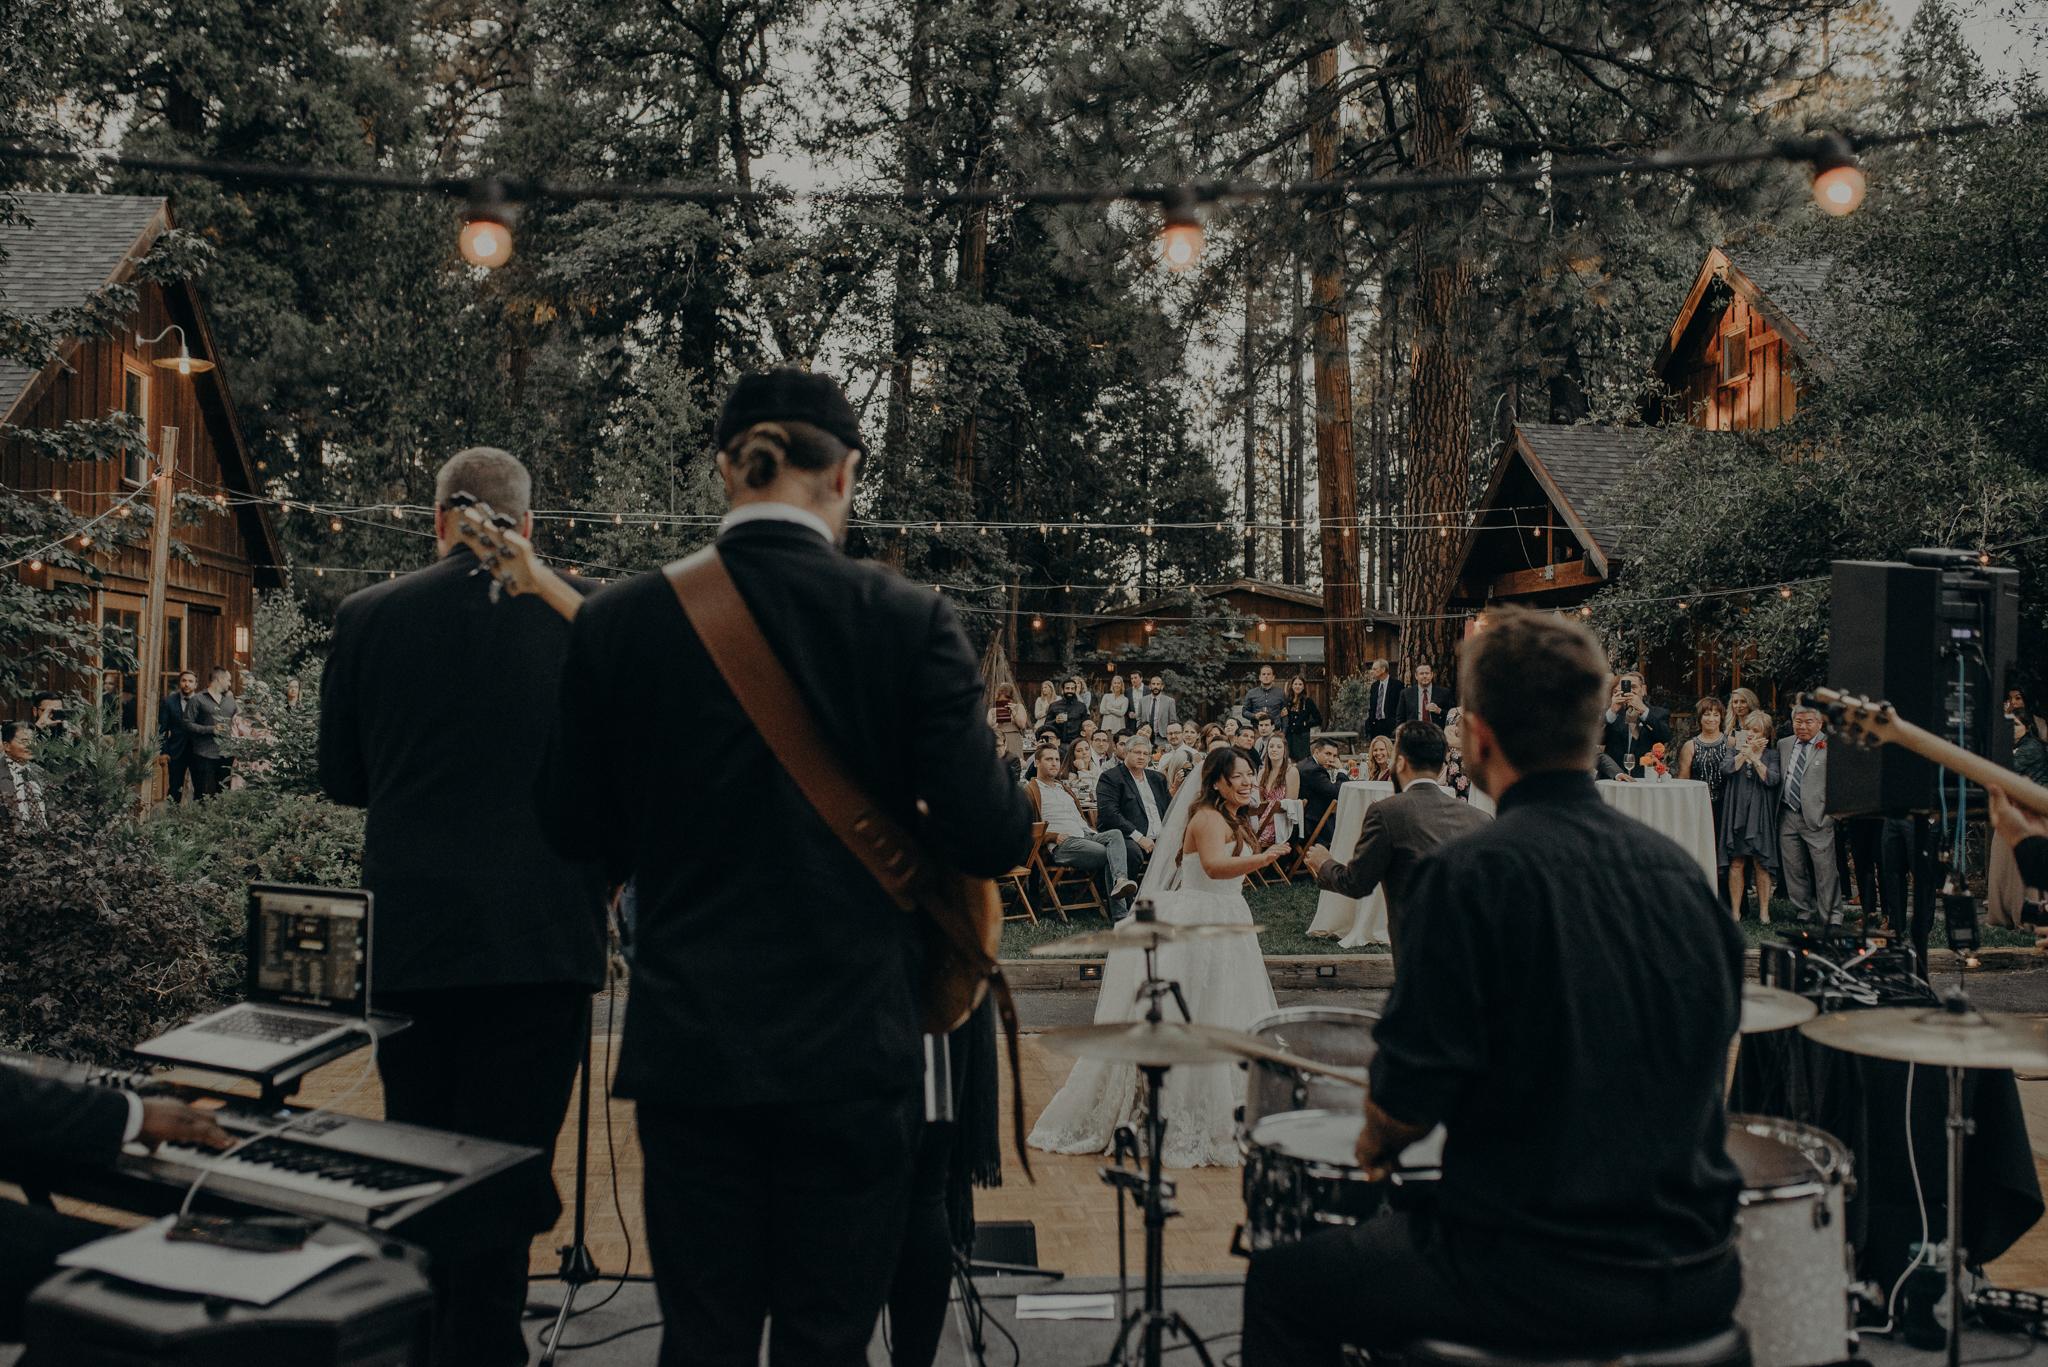 Yosemite Elopement Photographer - Evergreen Lodge Wedding Photographer - IsaiahAndTaylor.com-130.jpg